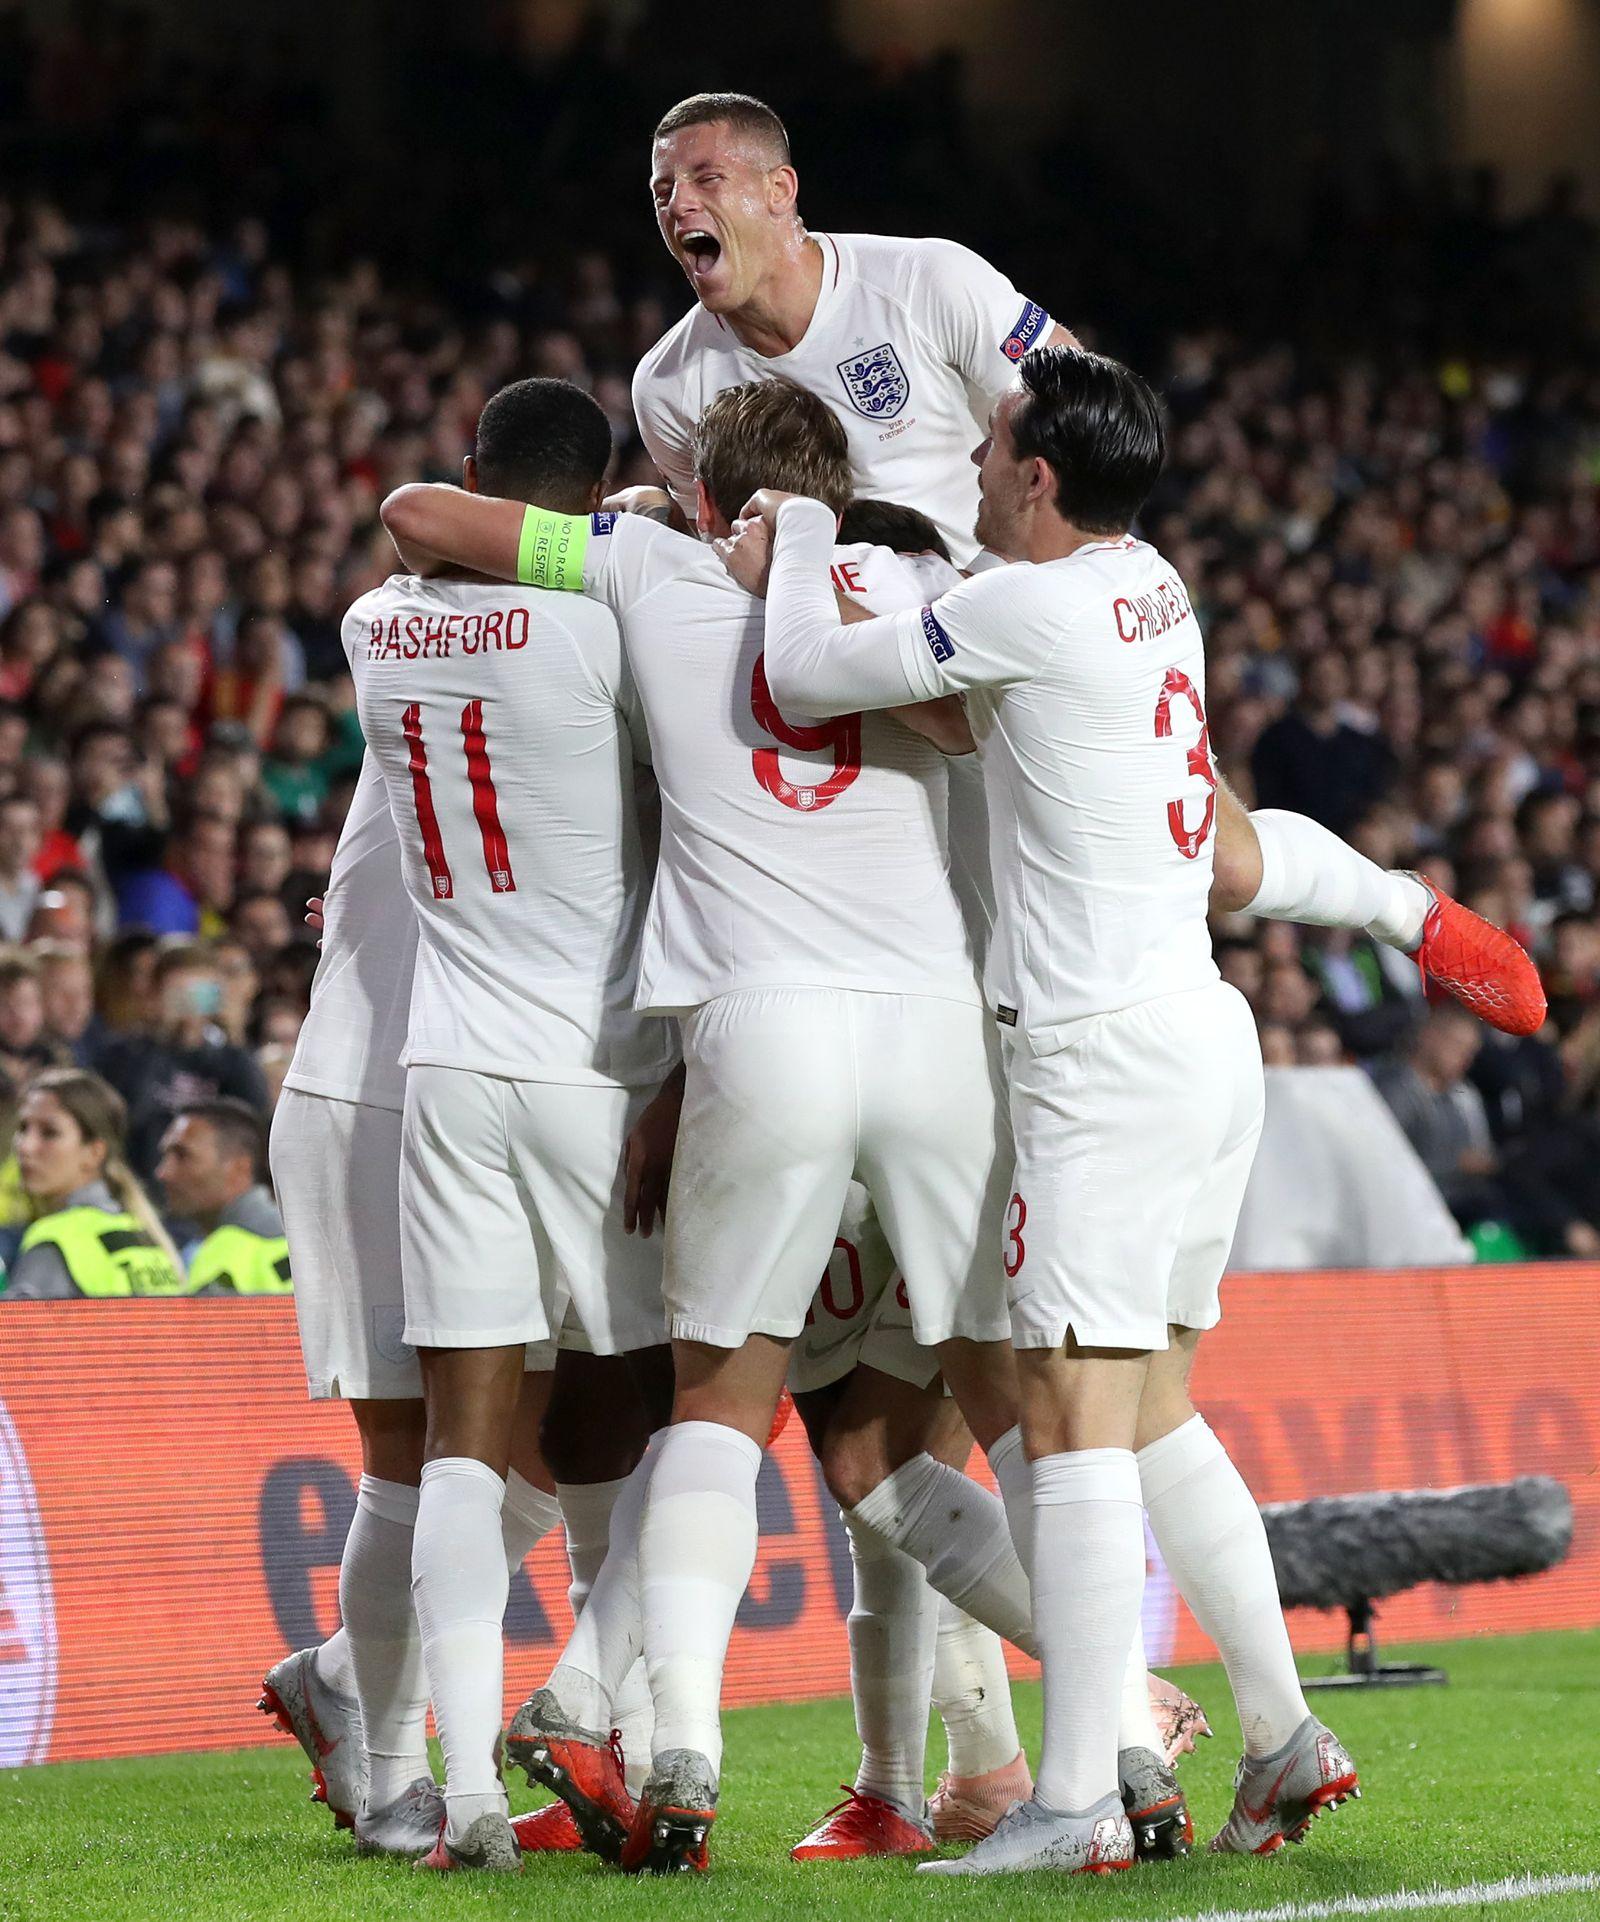 Spain v England - UEFA Nations League - Group A4 - Benito Villama